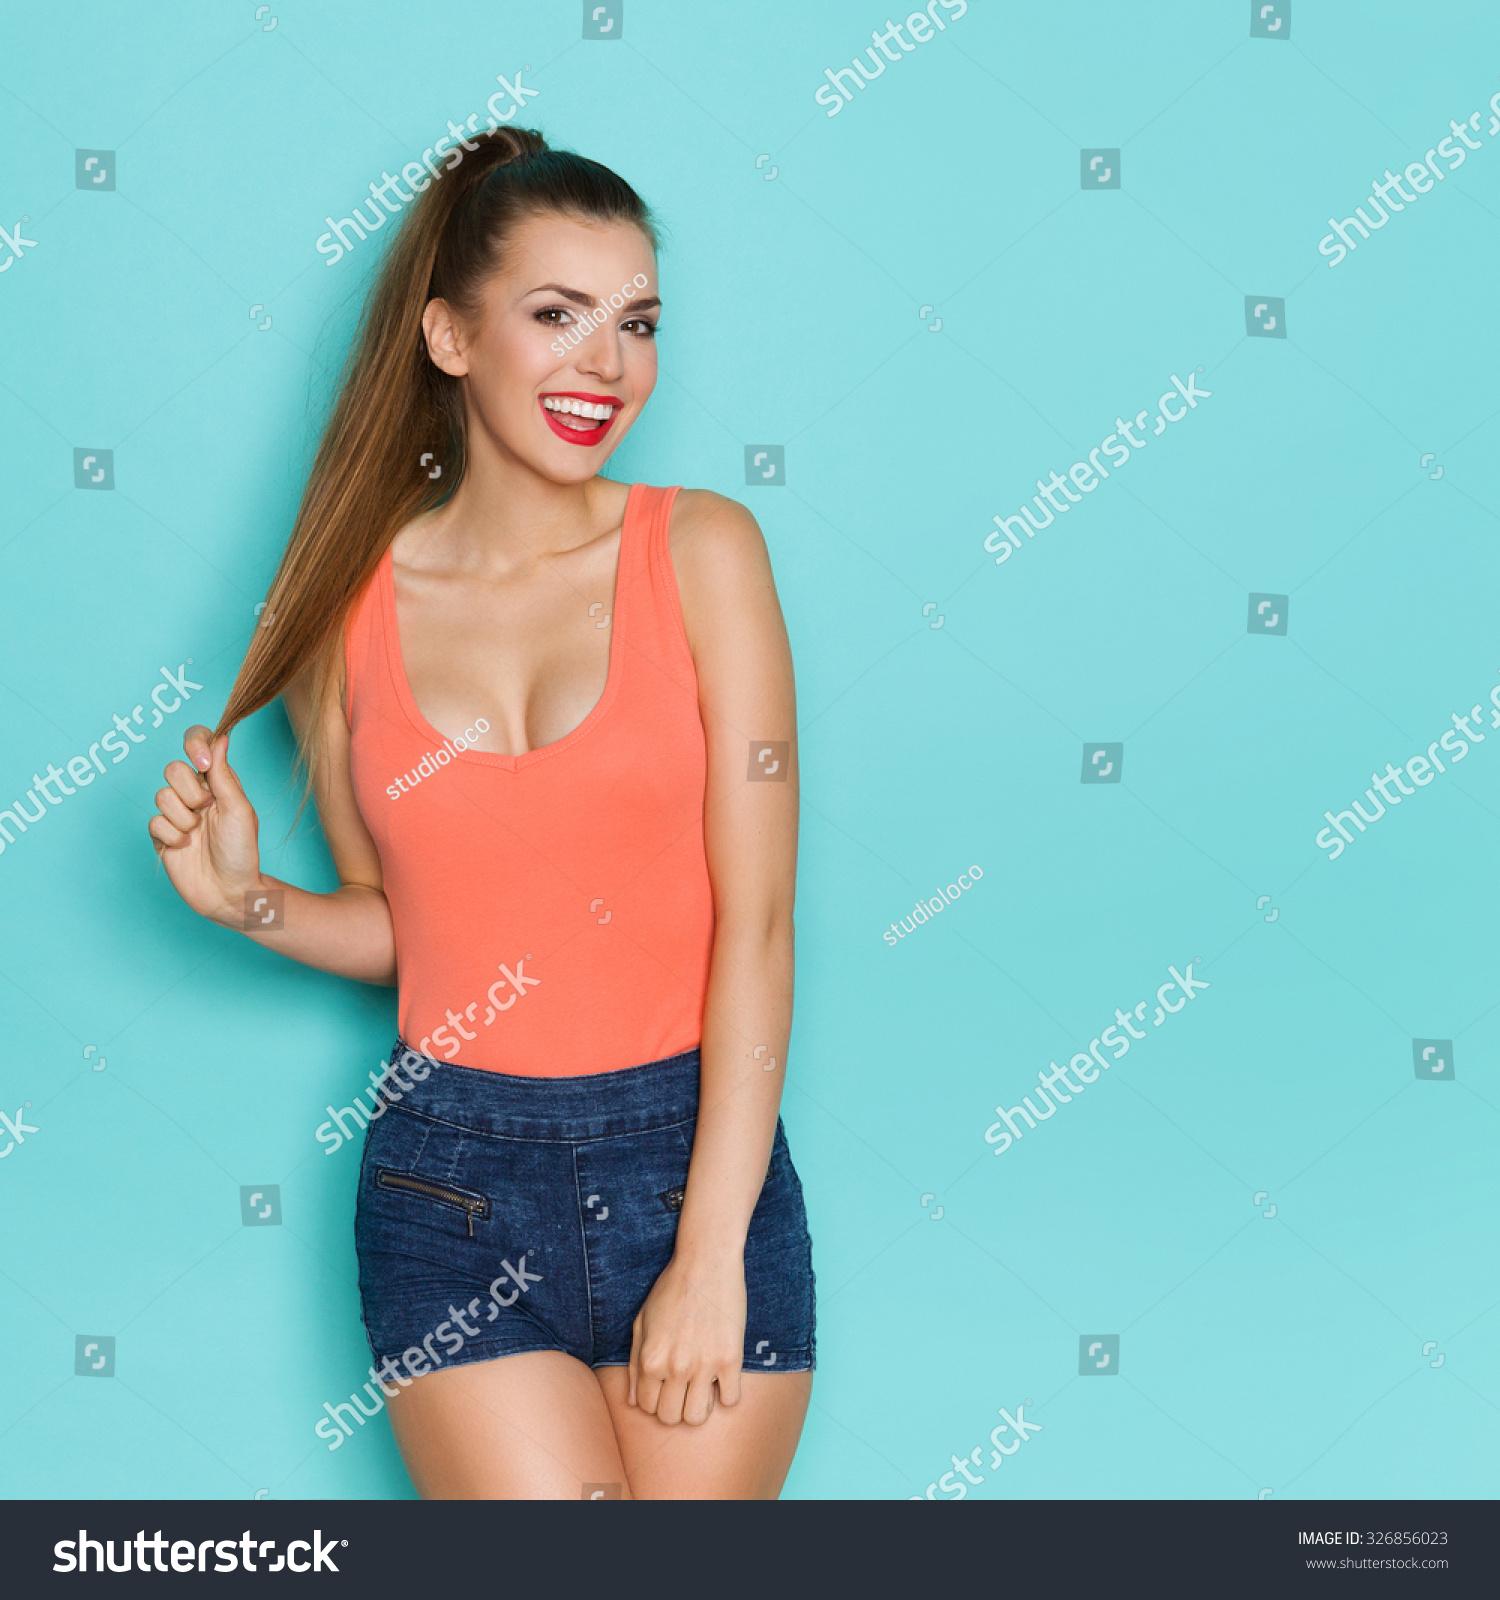 women minimalism cleavage - photo #37